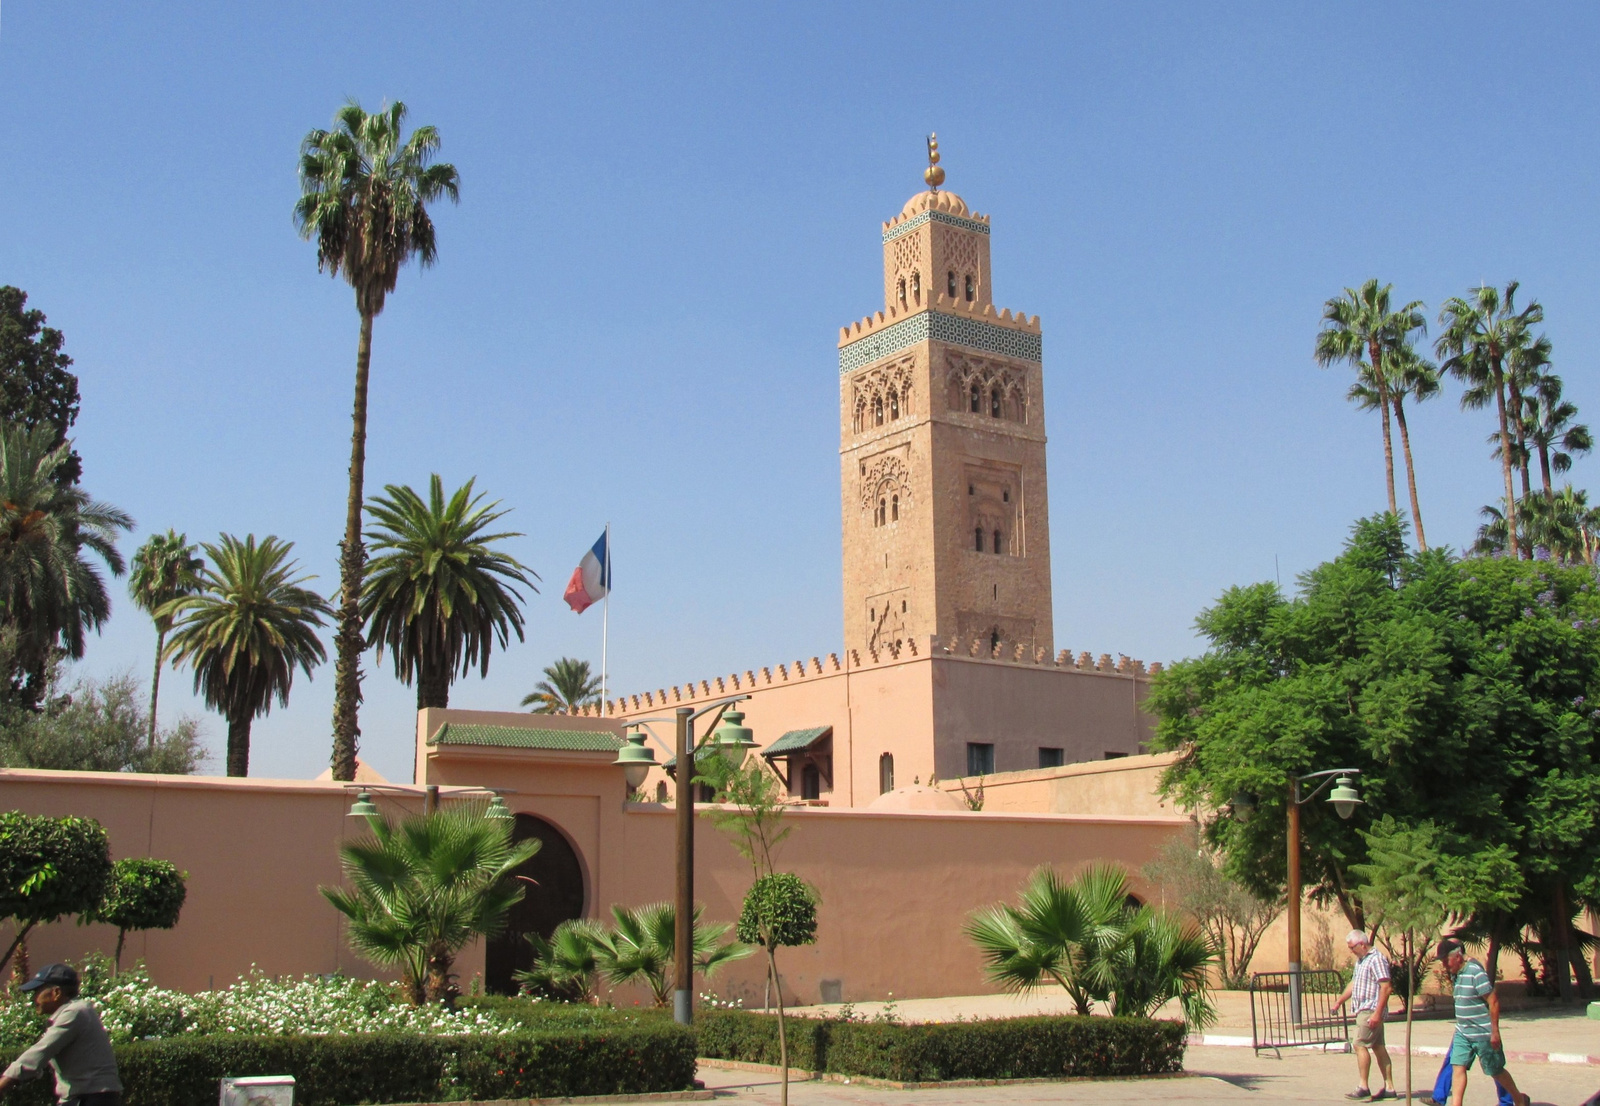 Koutoubia mecset